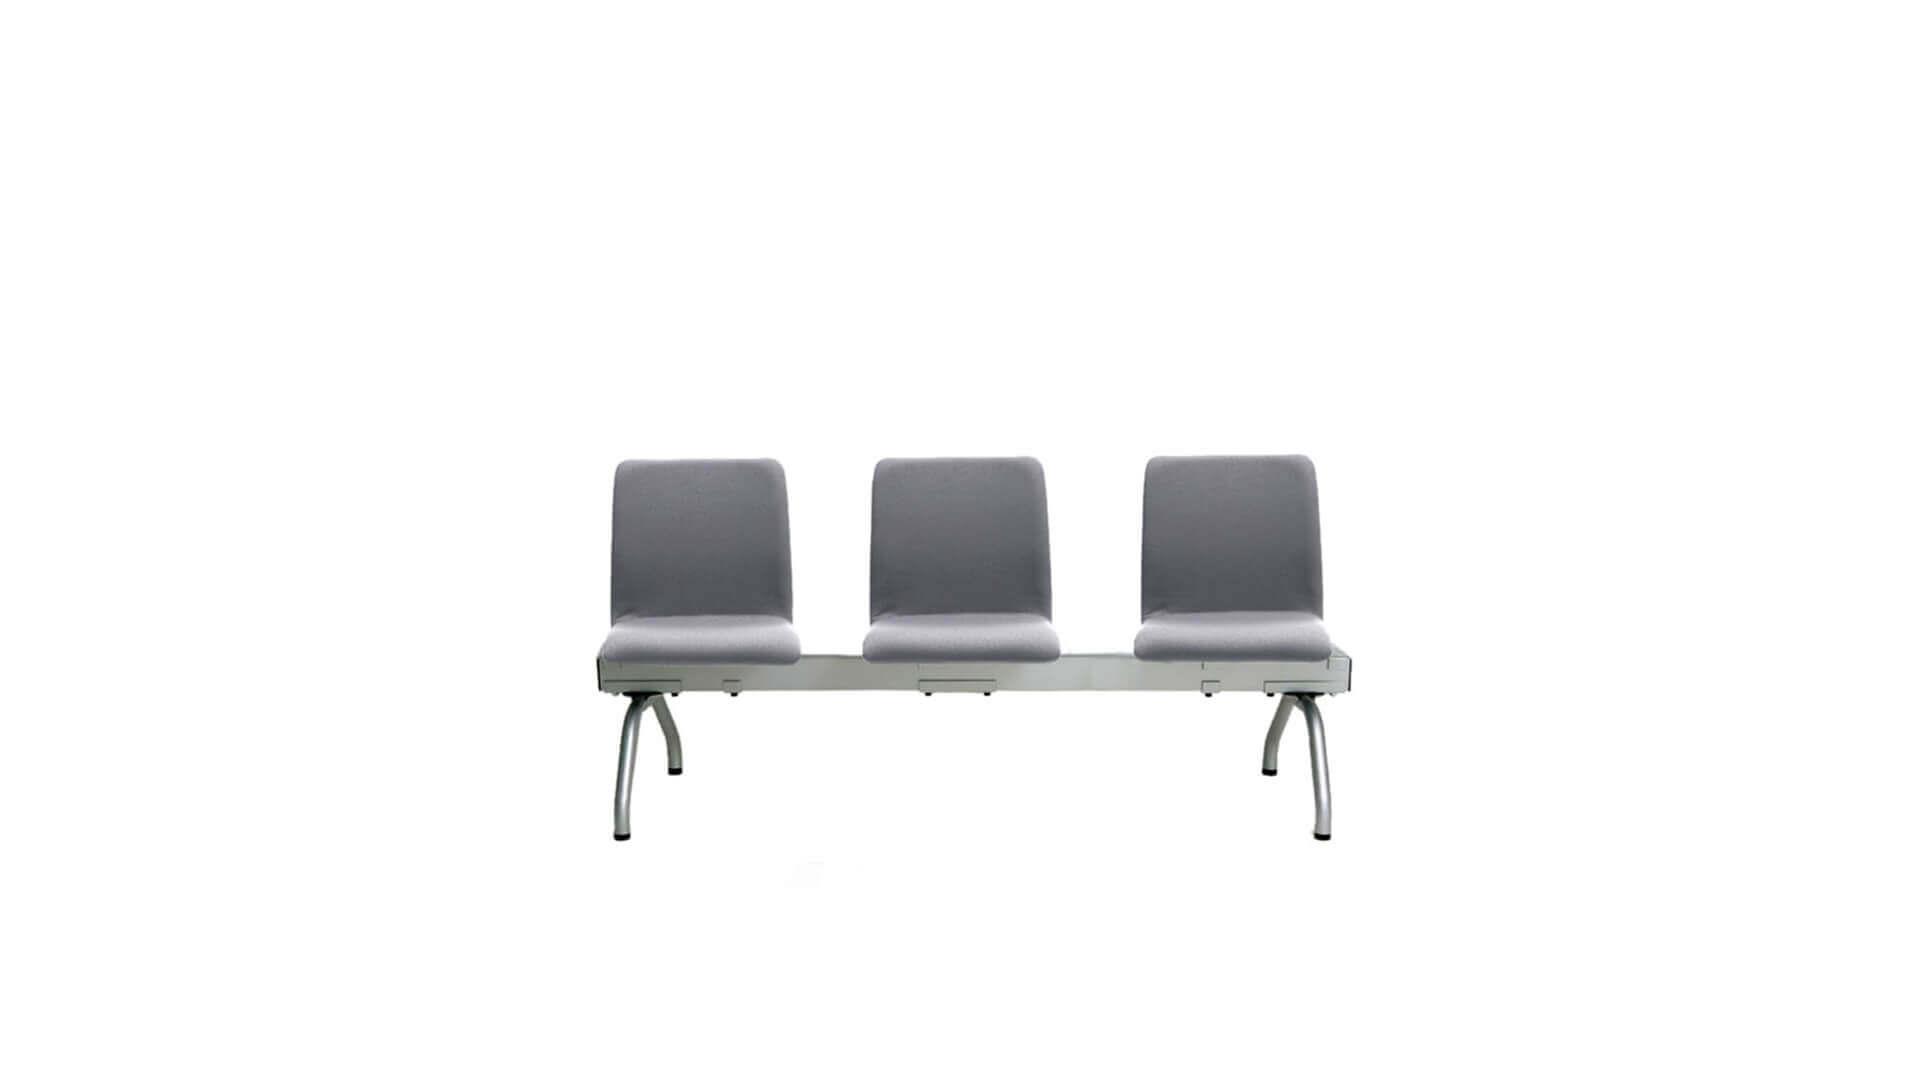 Bancada con 3 asientos funcional